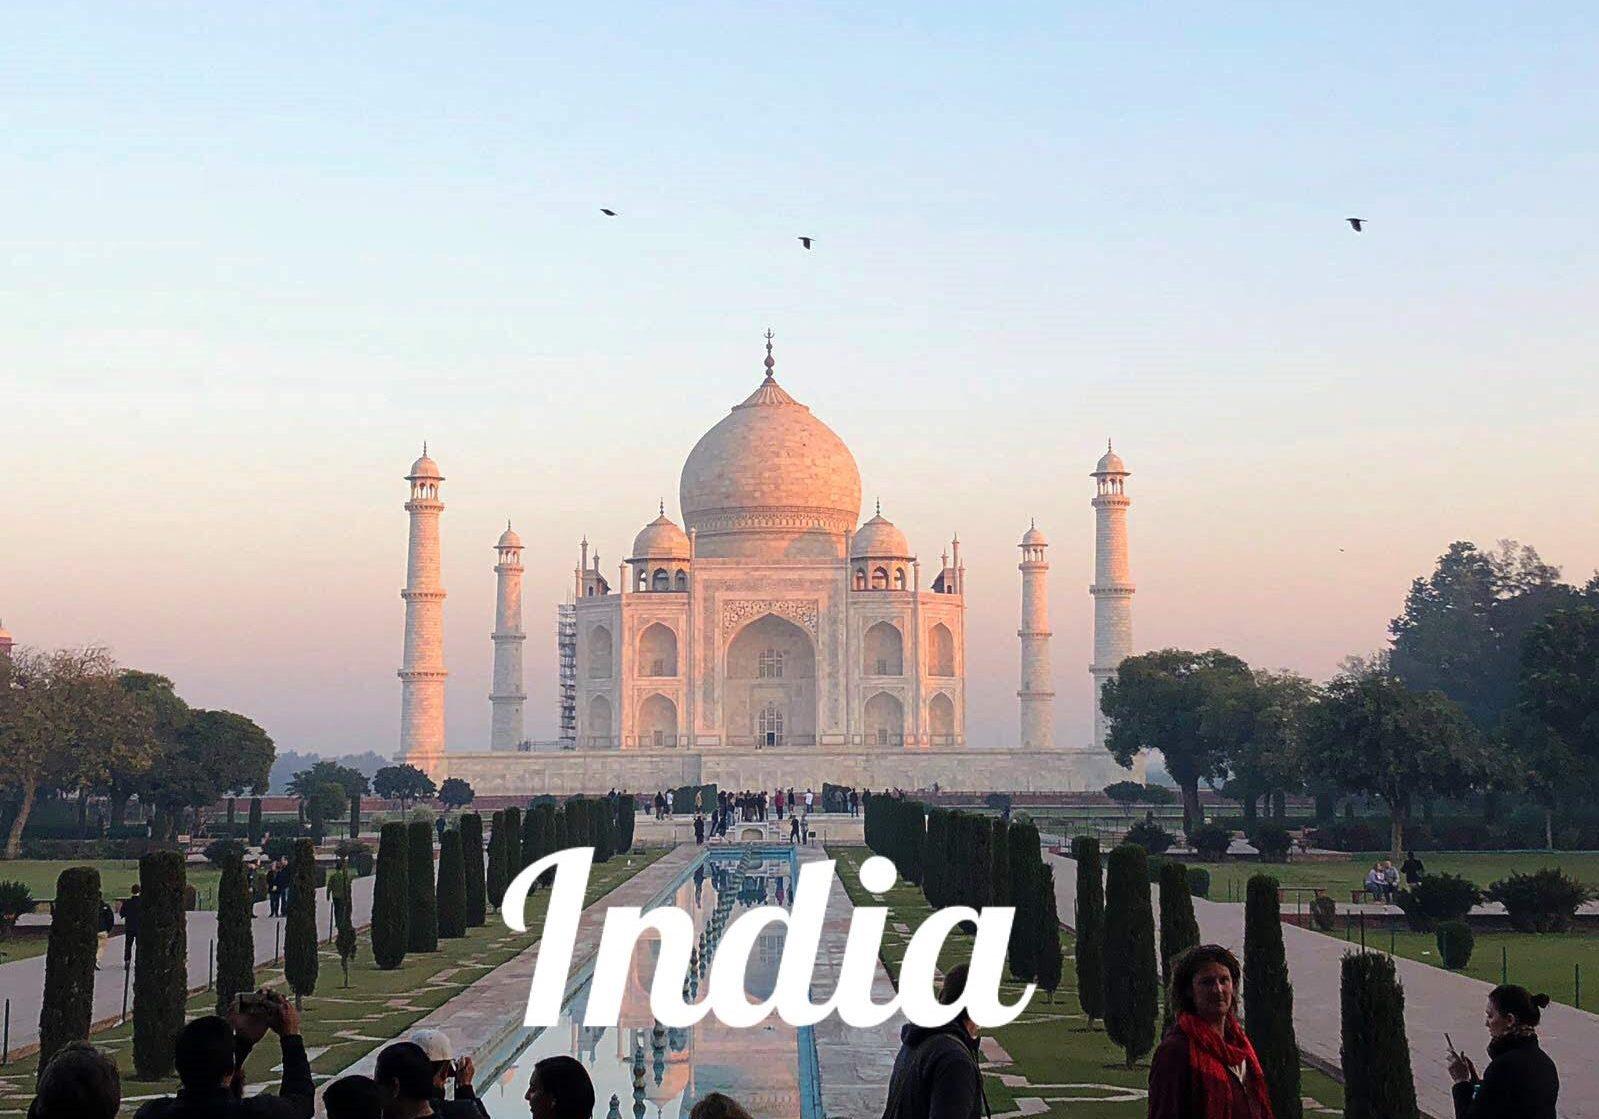 India, wanderdaze, blog, travelling, travel blog,